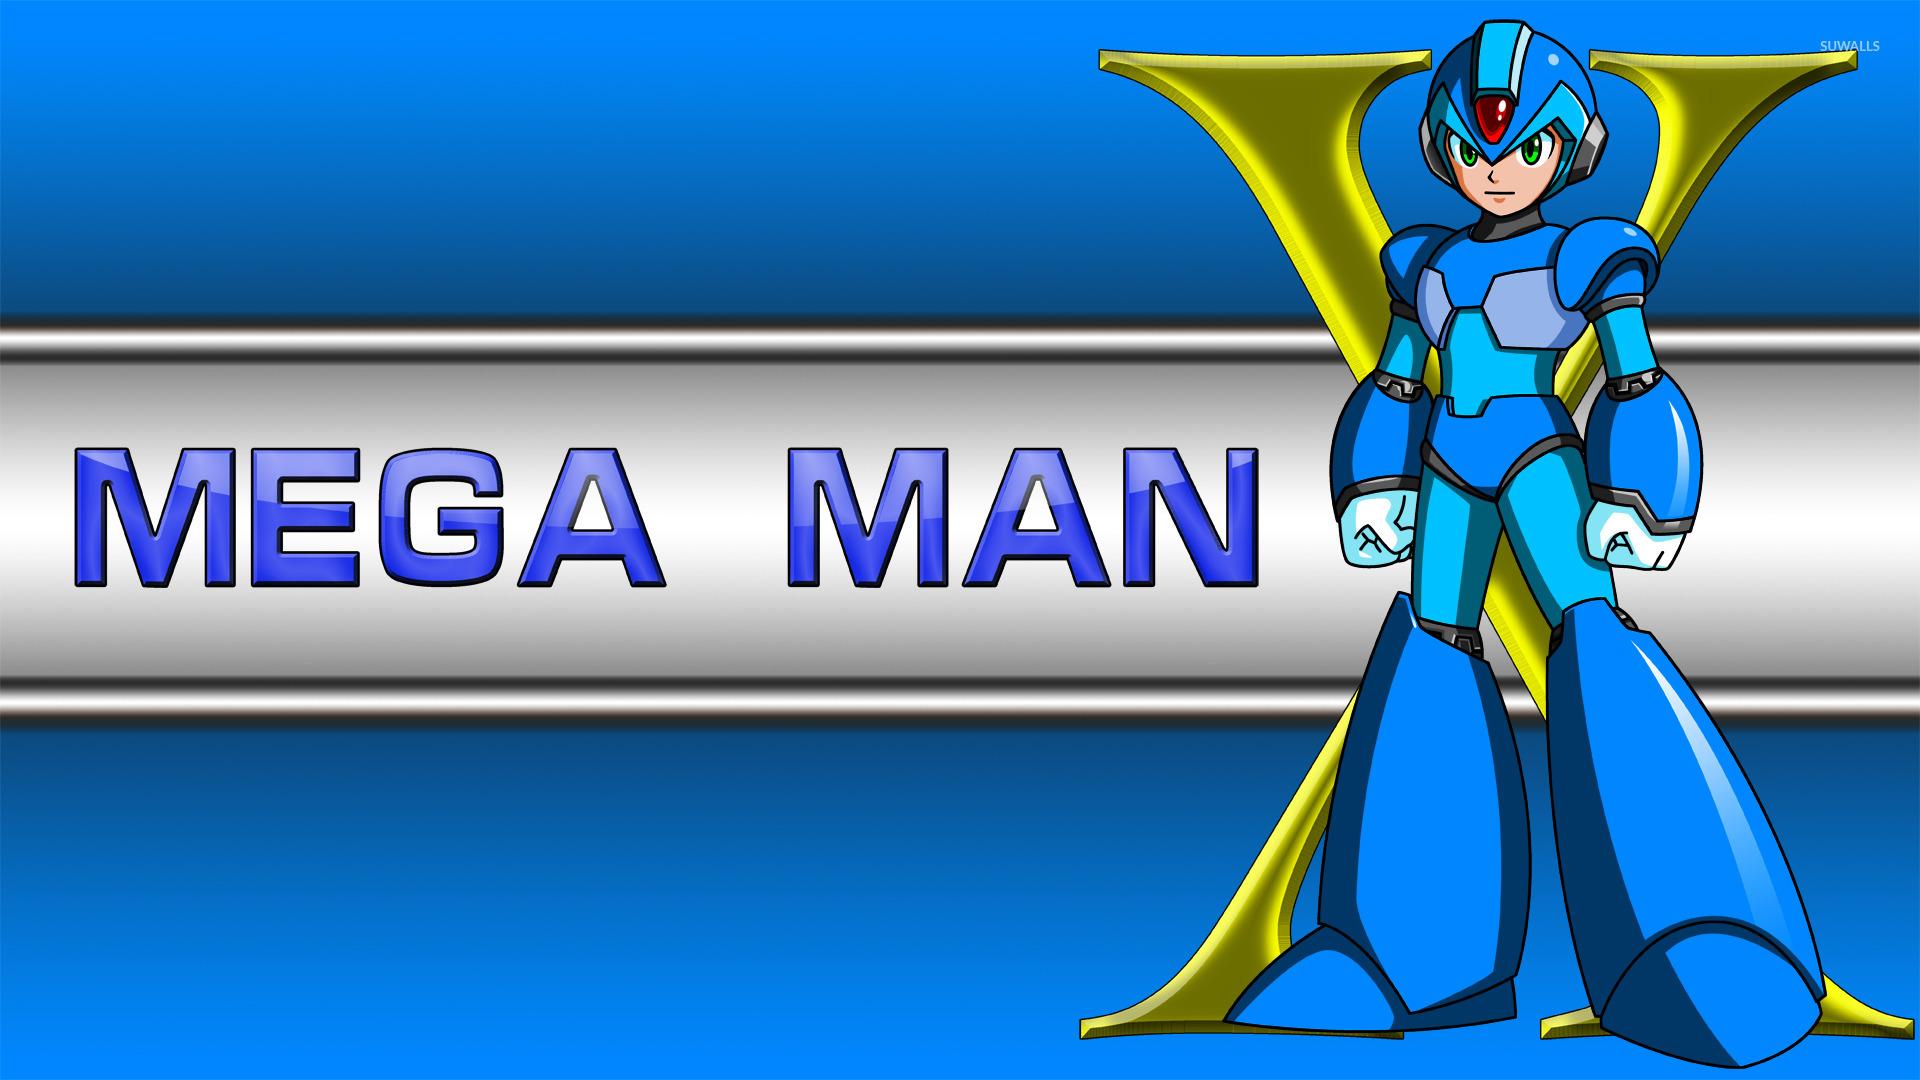 Mega Man X 2 Wallpaper Game Wallpapers 22633